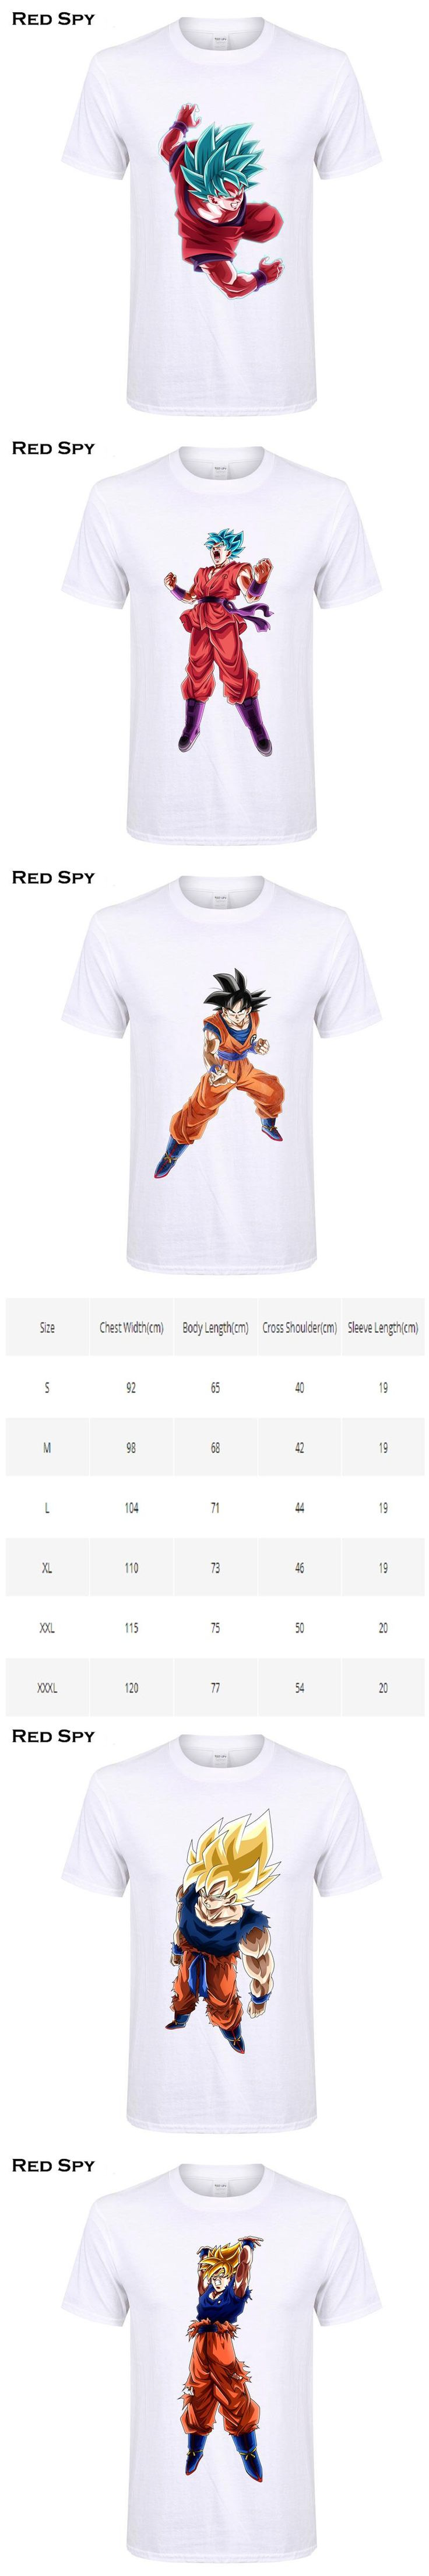 RED SPY Summer Cotton T shirt Men Raditz Majin Buu Frieza Son Goku Print Tops Tees Dragon Ball t shirts Dragon Ball Z T-shirt